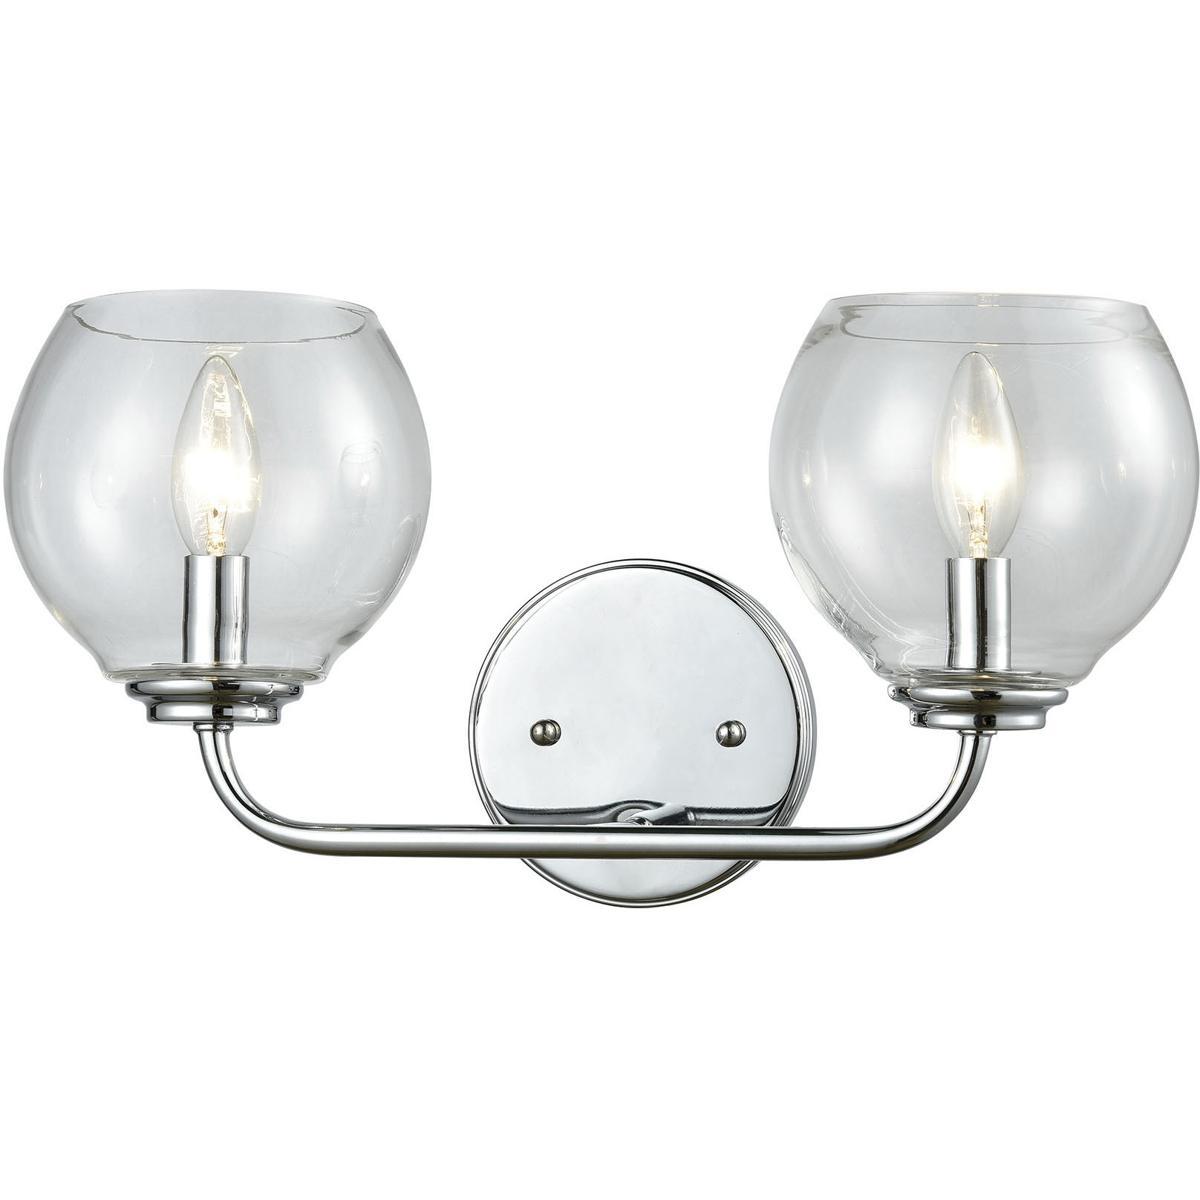 Elk lighting 81361 2 emory bathroom vanity light polished chrome